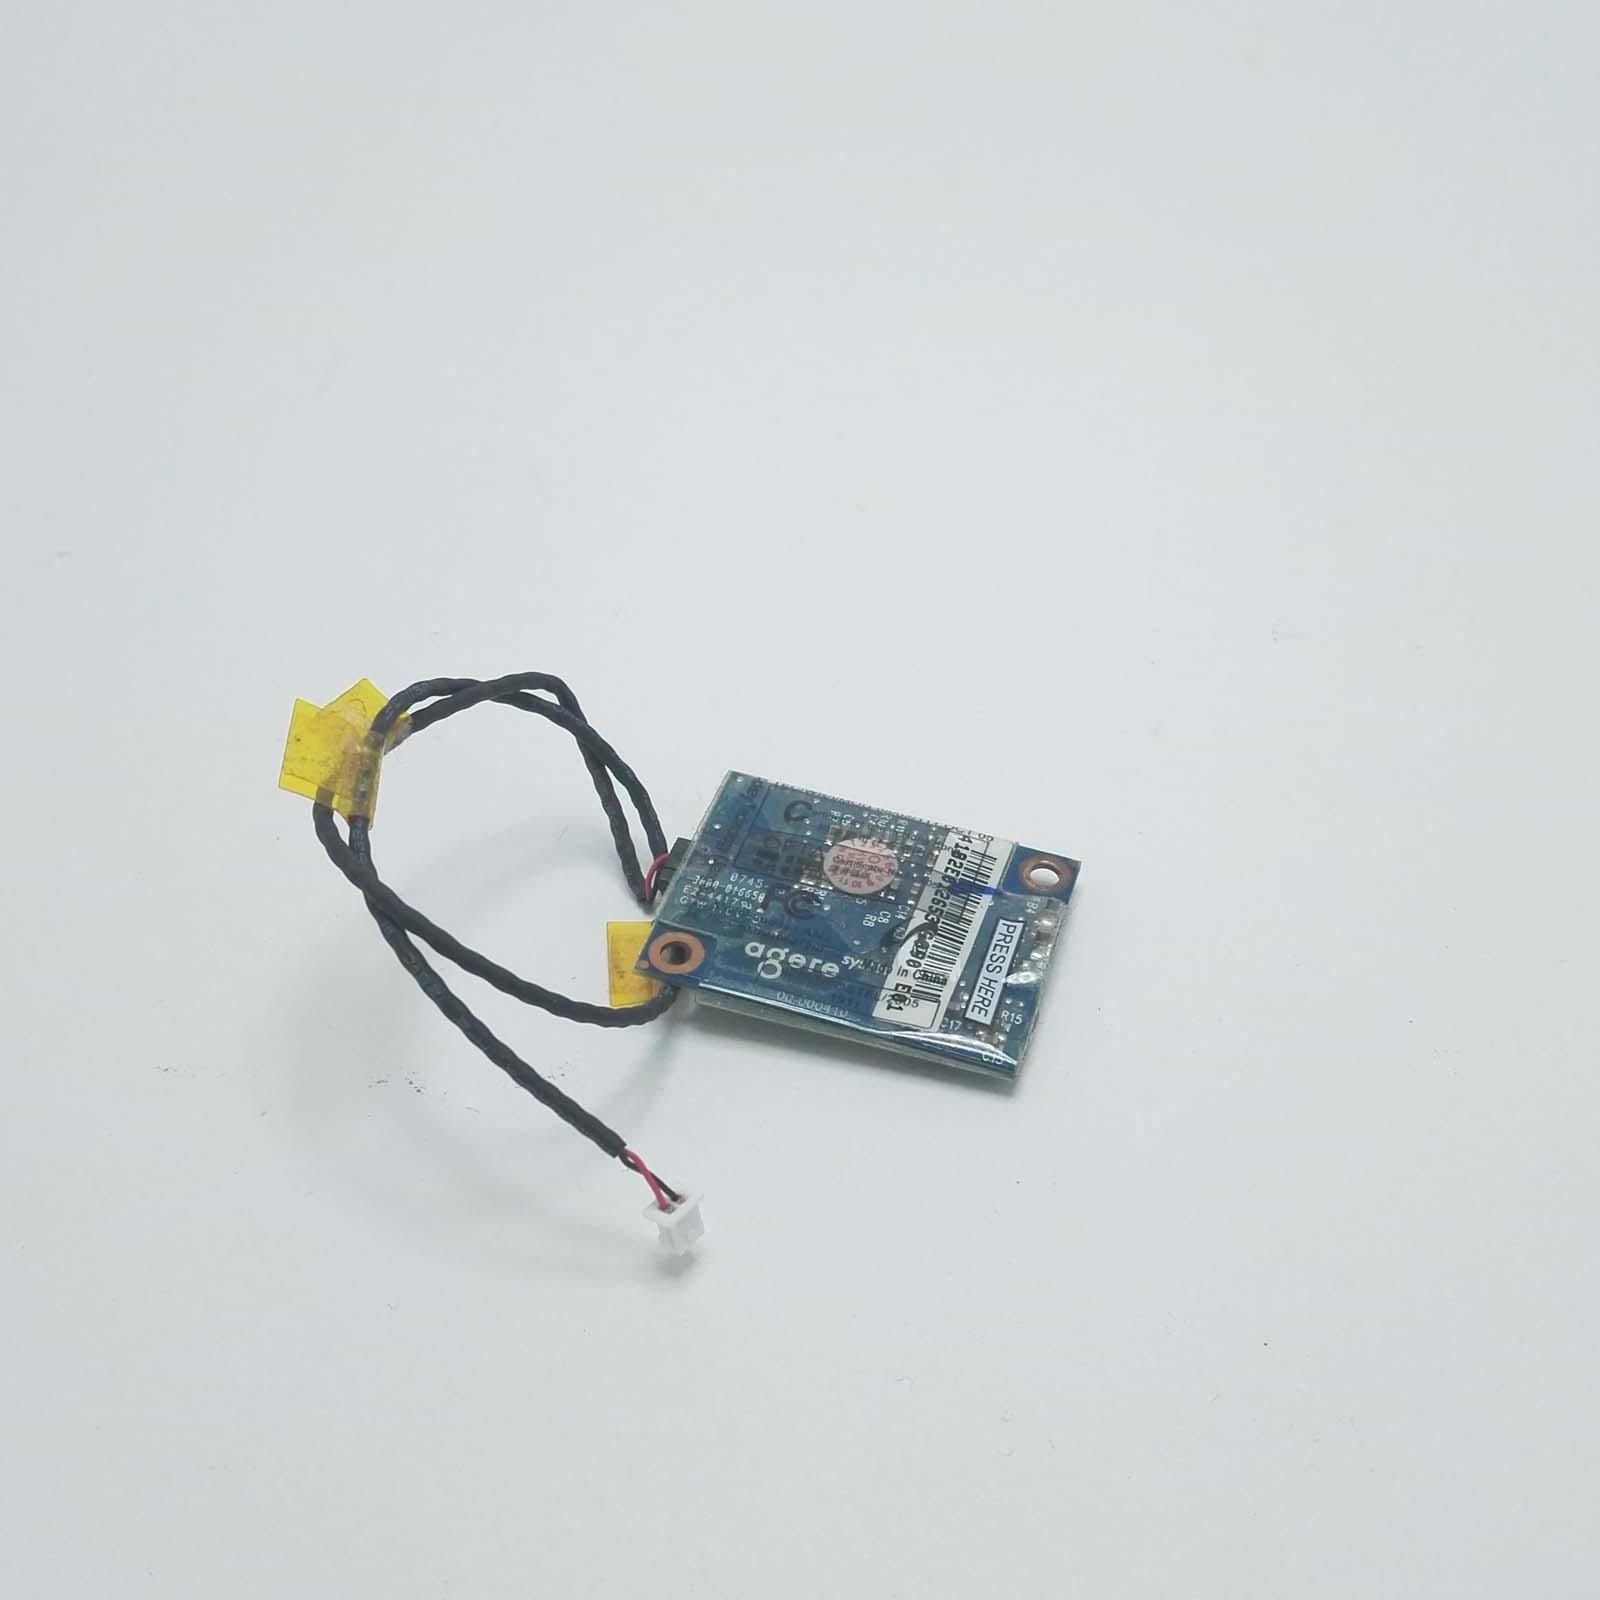 Modem 3000-016650 Samsung R60 Plus NP-R60S e altri modelli